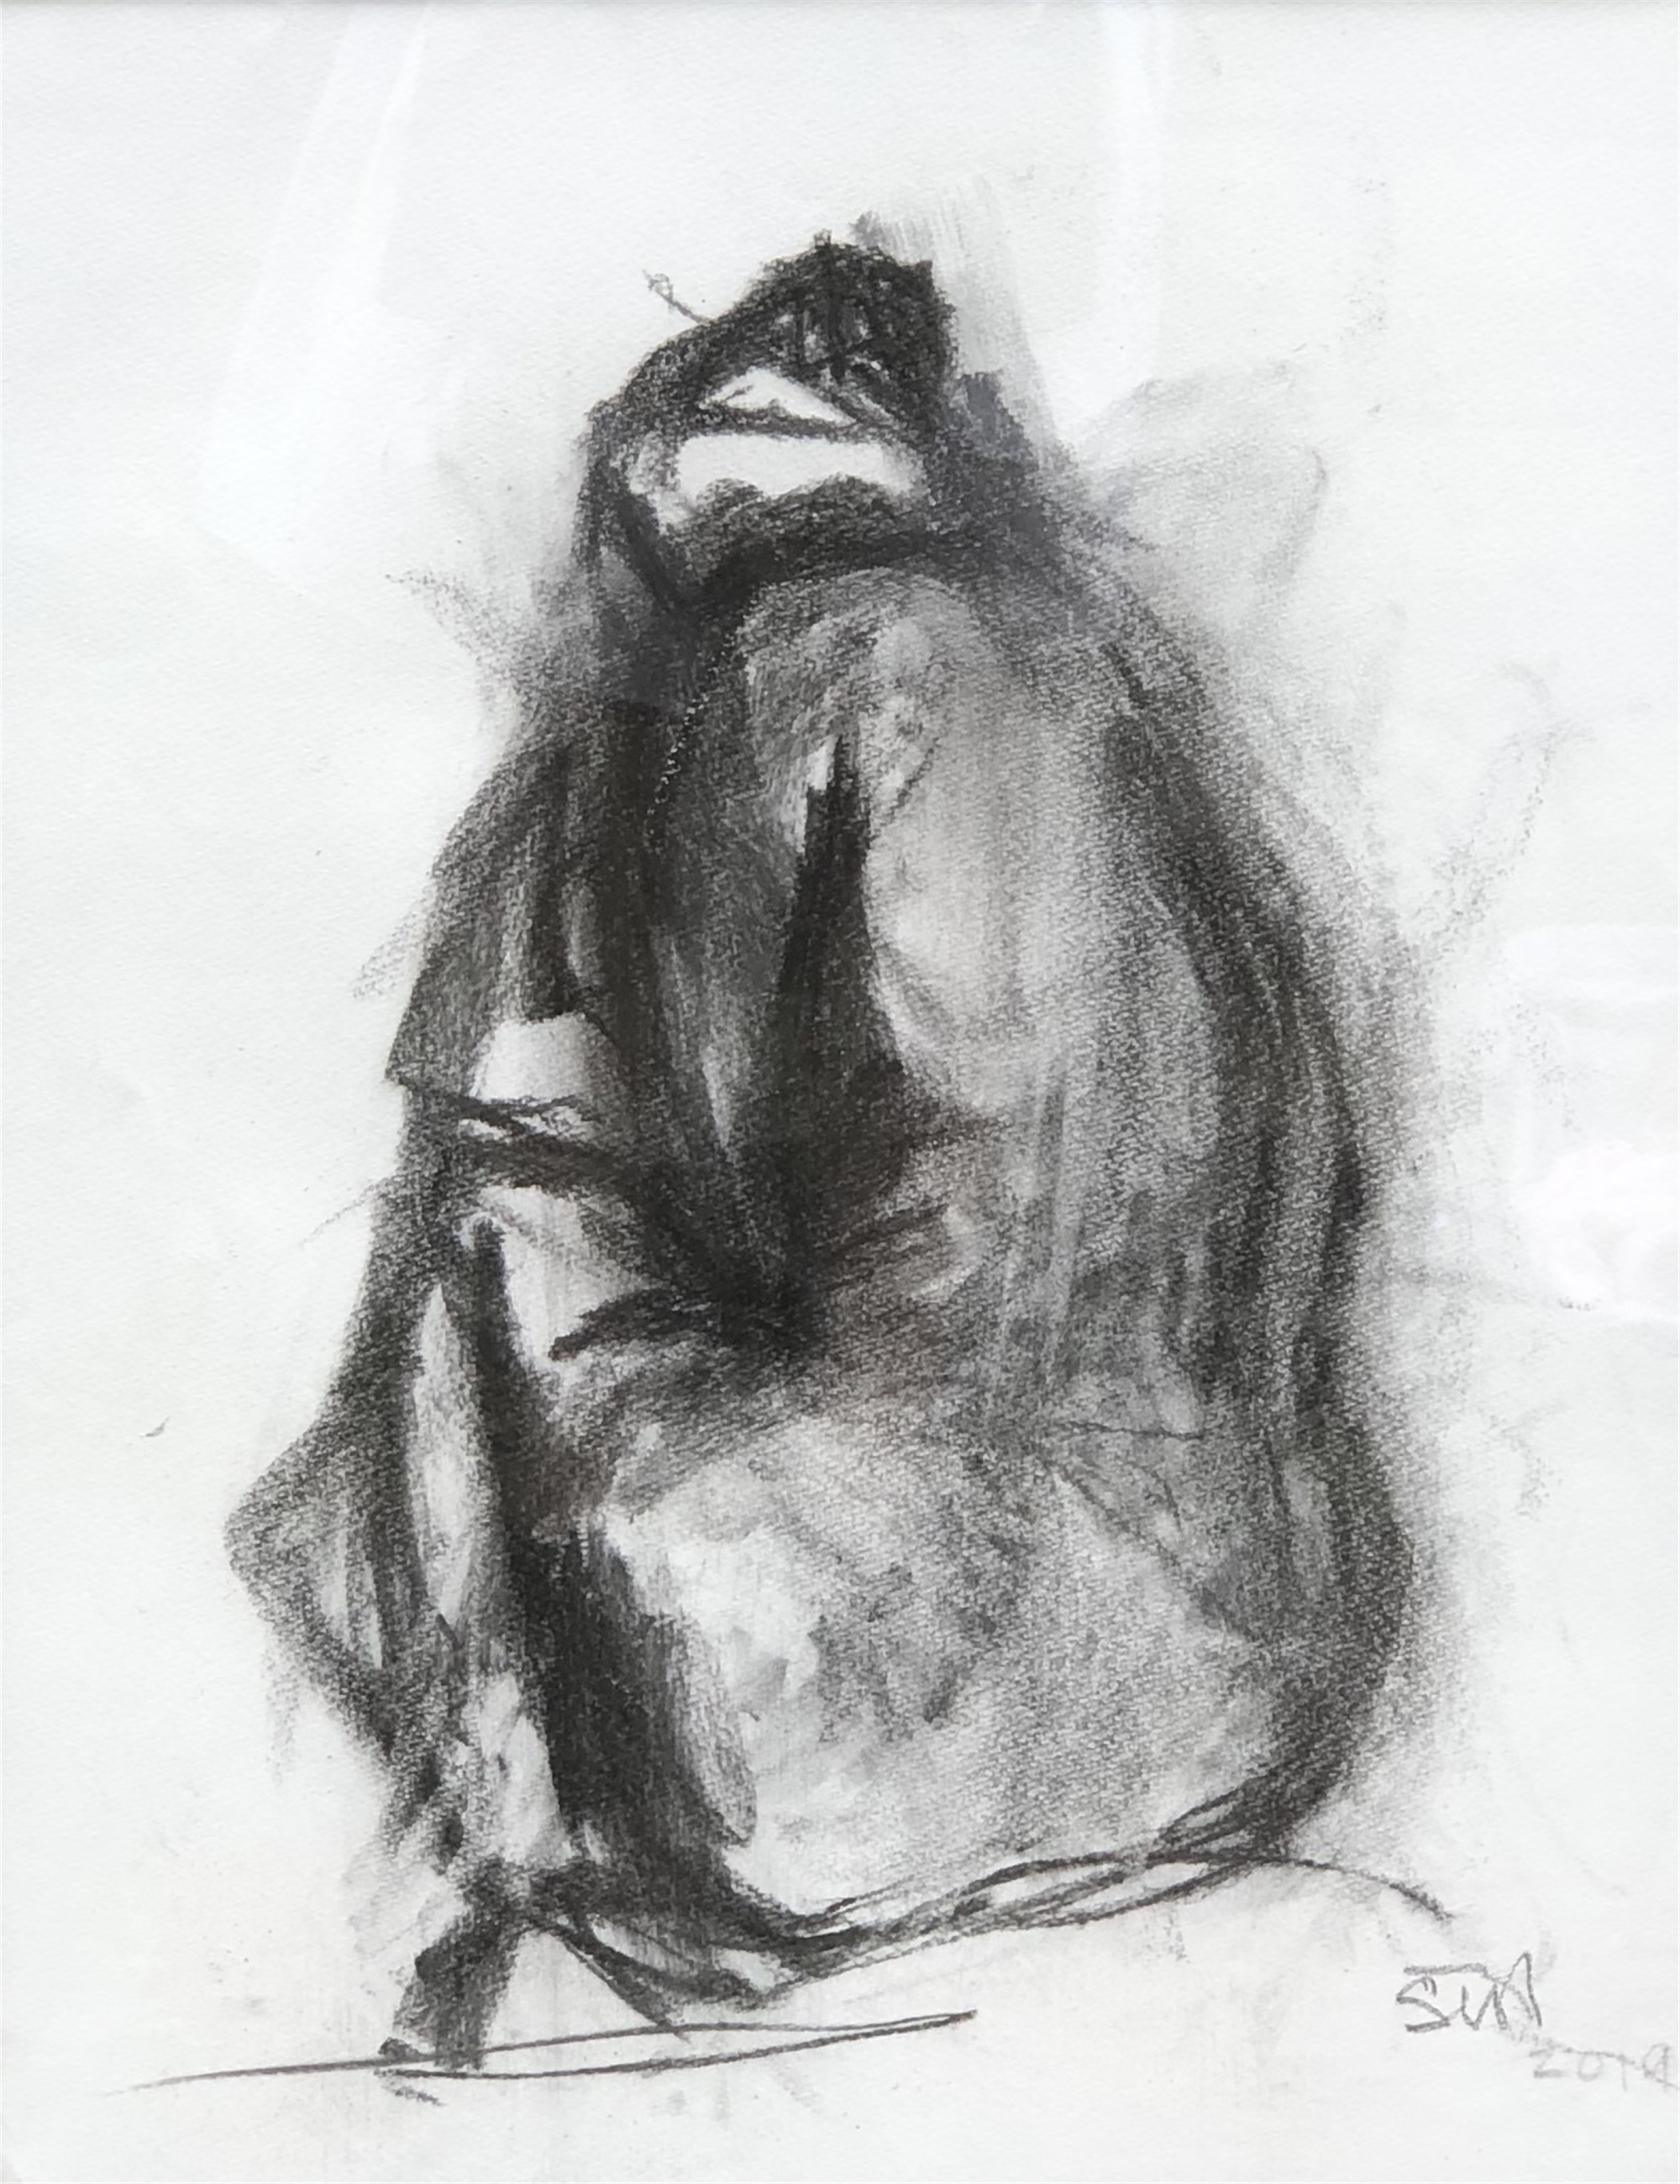 Gestural V by Susan Altman